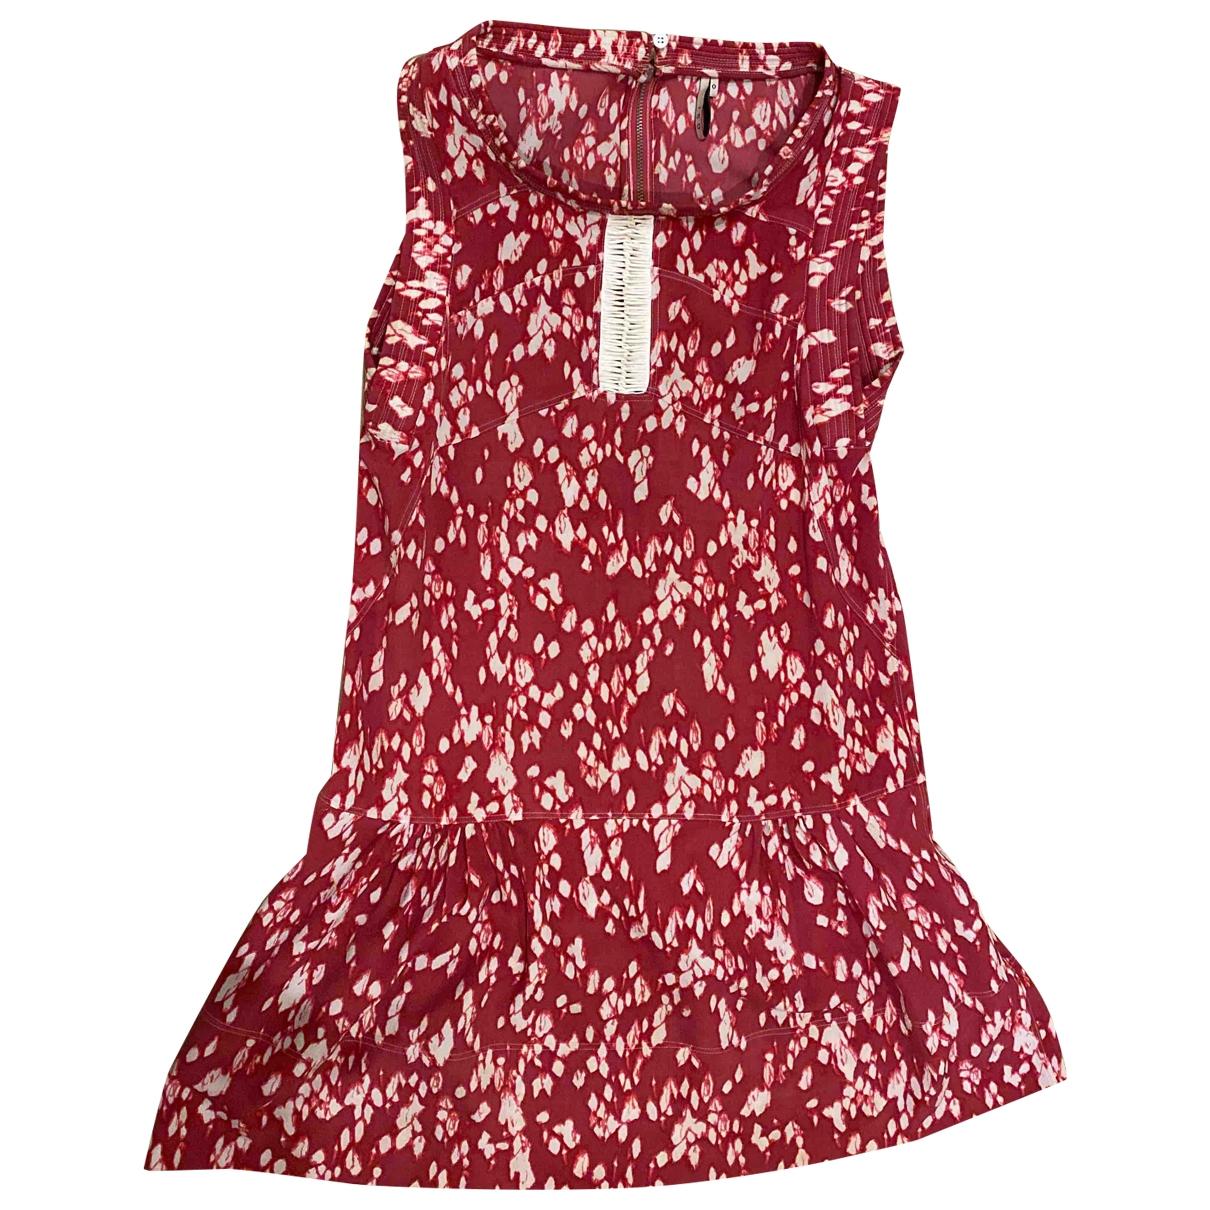 Iro \N Kleid in  Rot Polyester